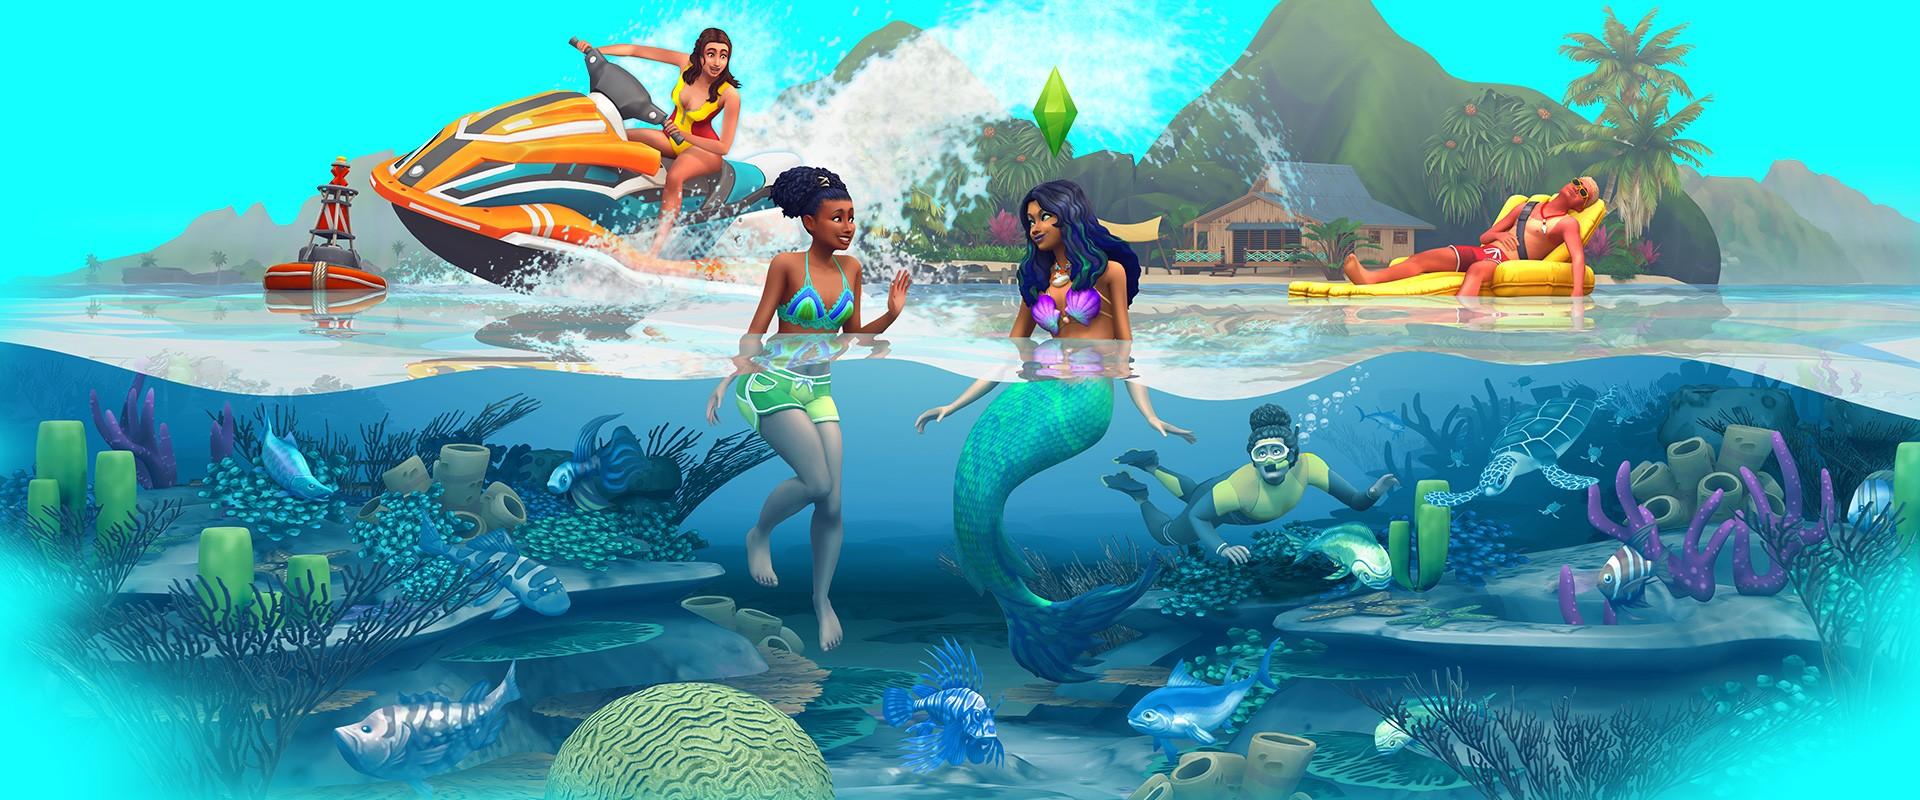 The Sims™ 4 Island Living for PC/Mac | Origin